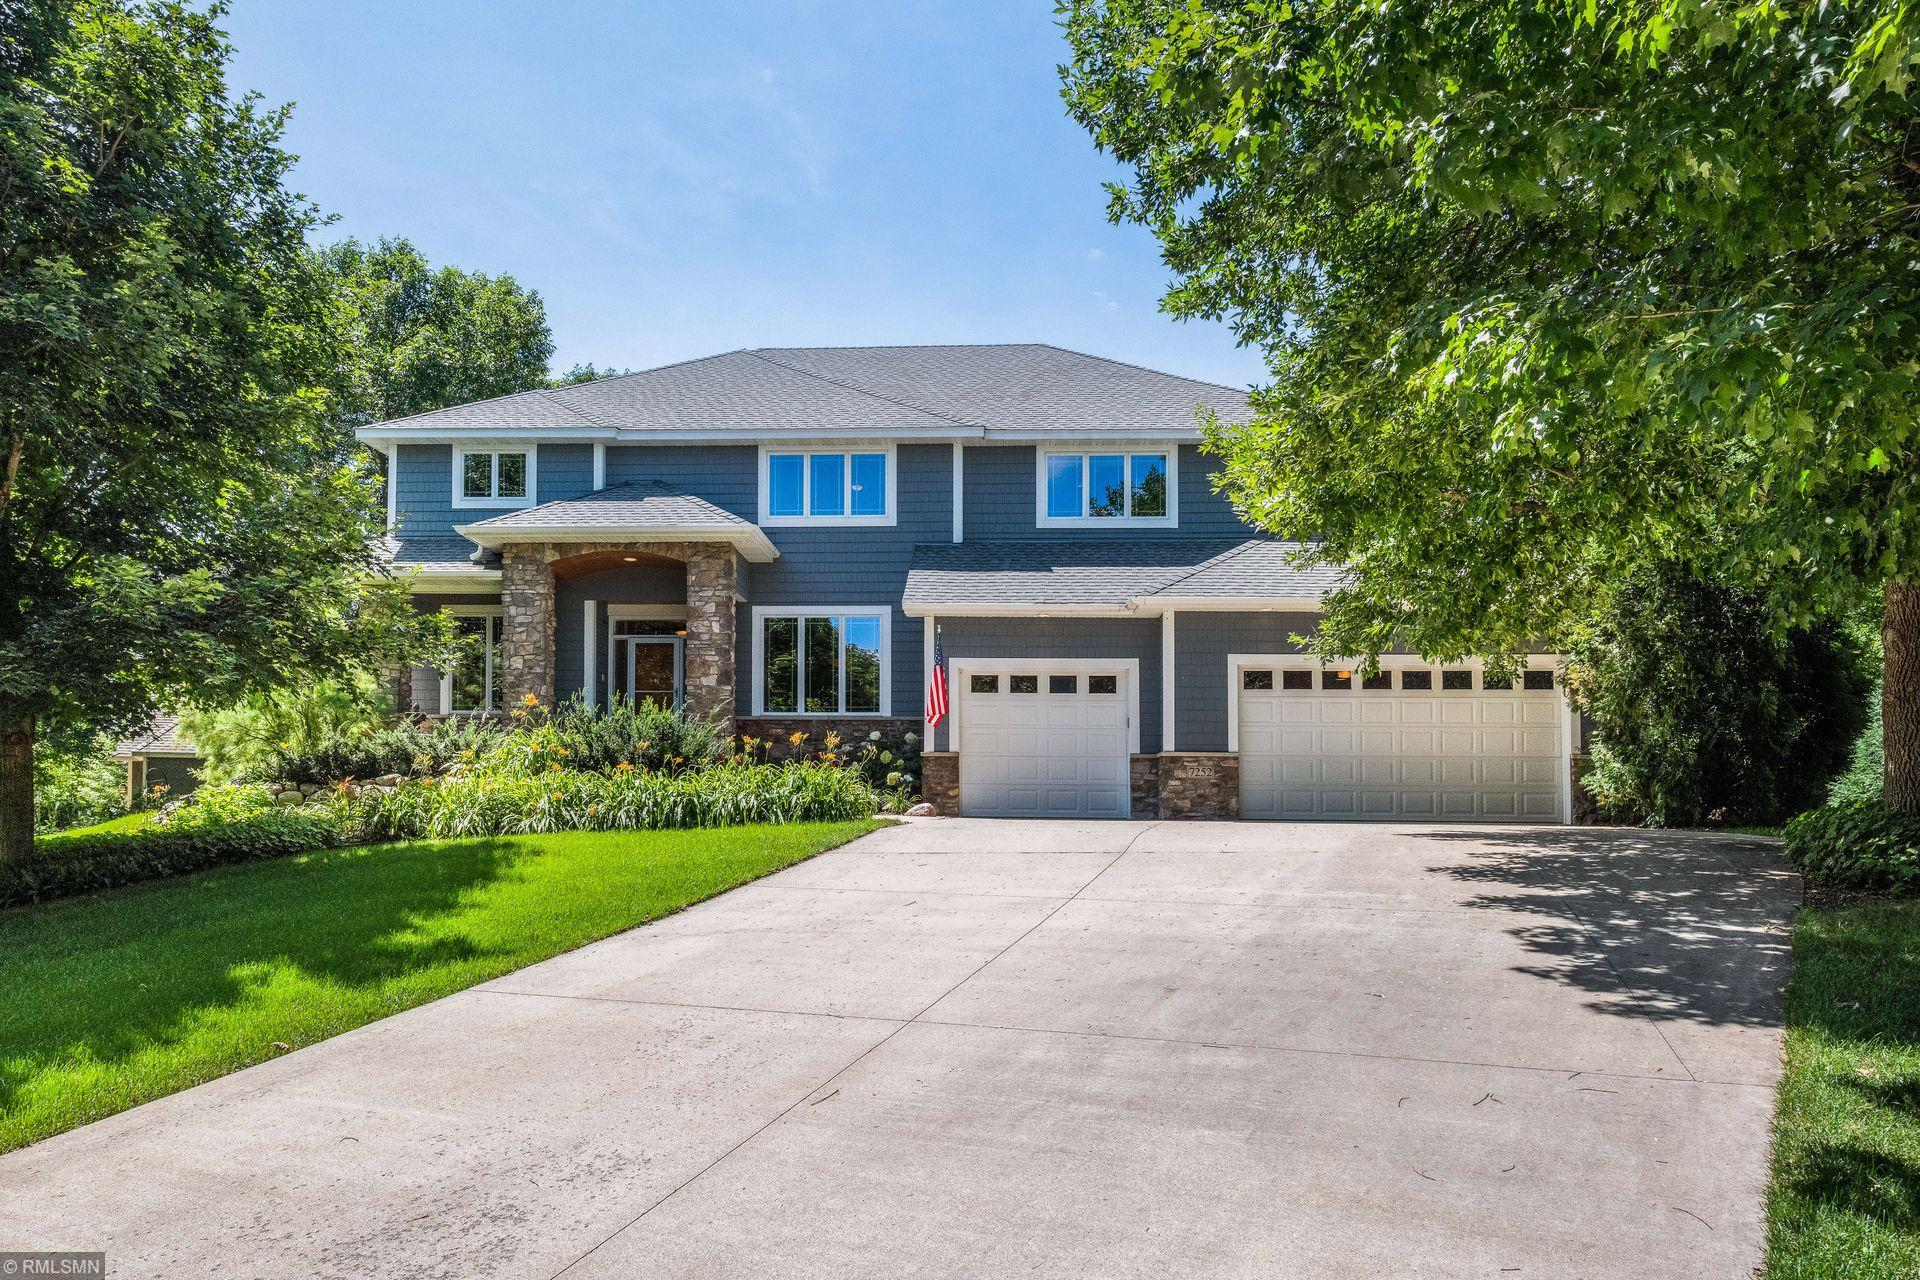 7252 Tamarack Trail Property Photo - Victoria, MN real estate listing